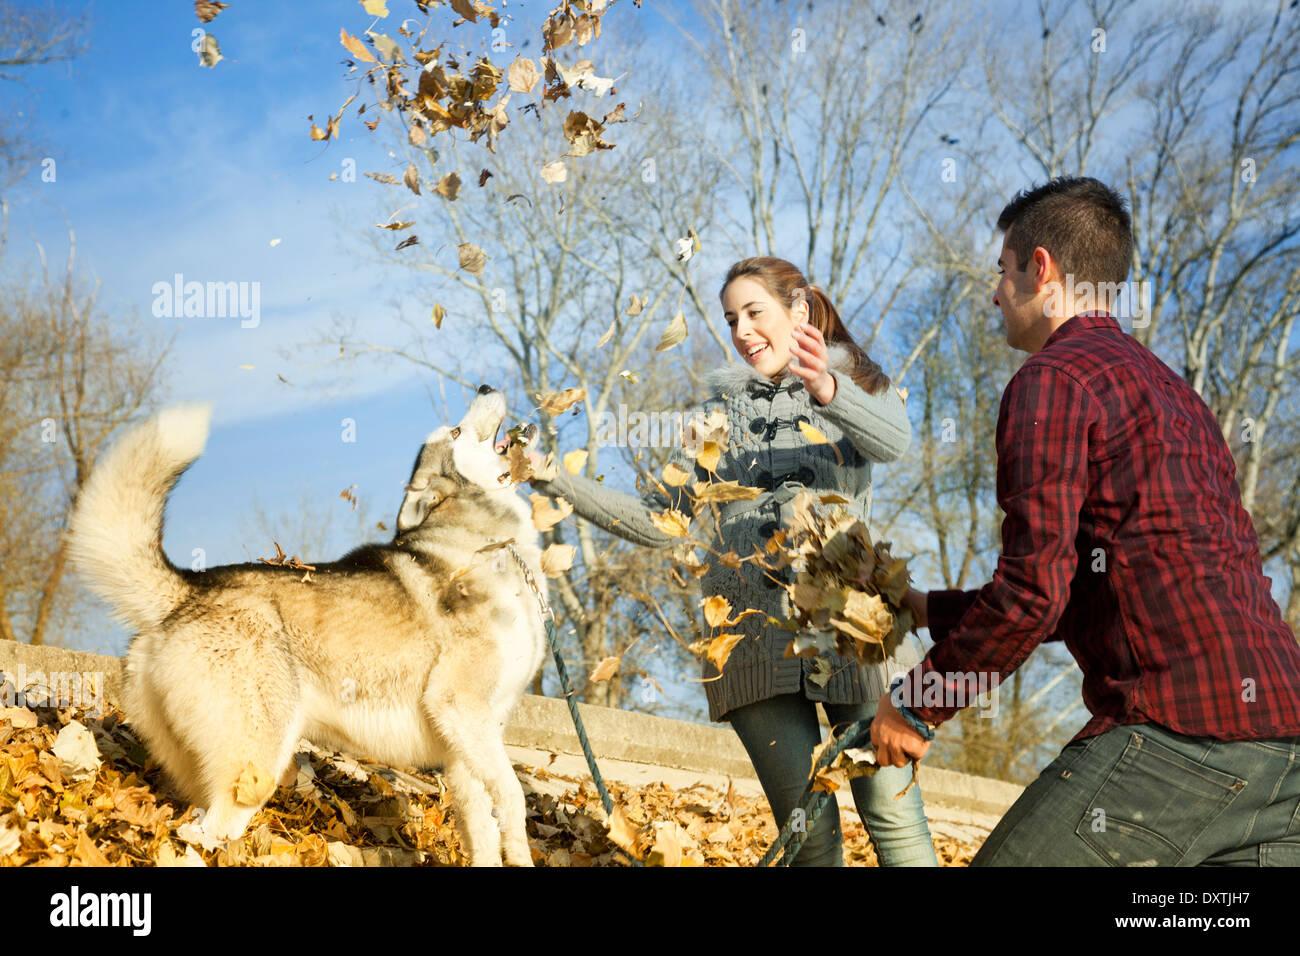 Couple with Dog Outdoors, Croatia - Stock Image